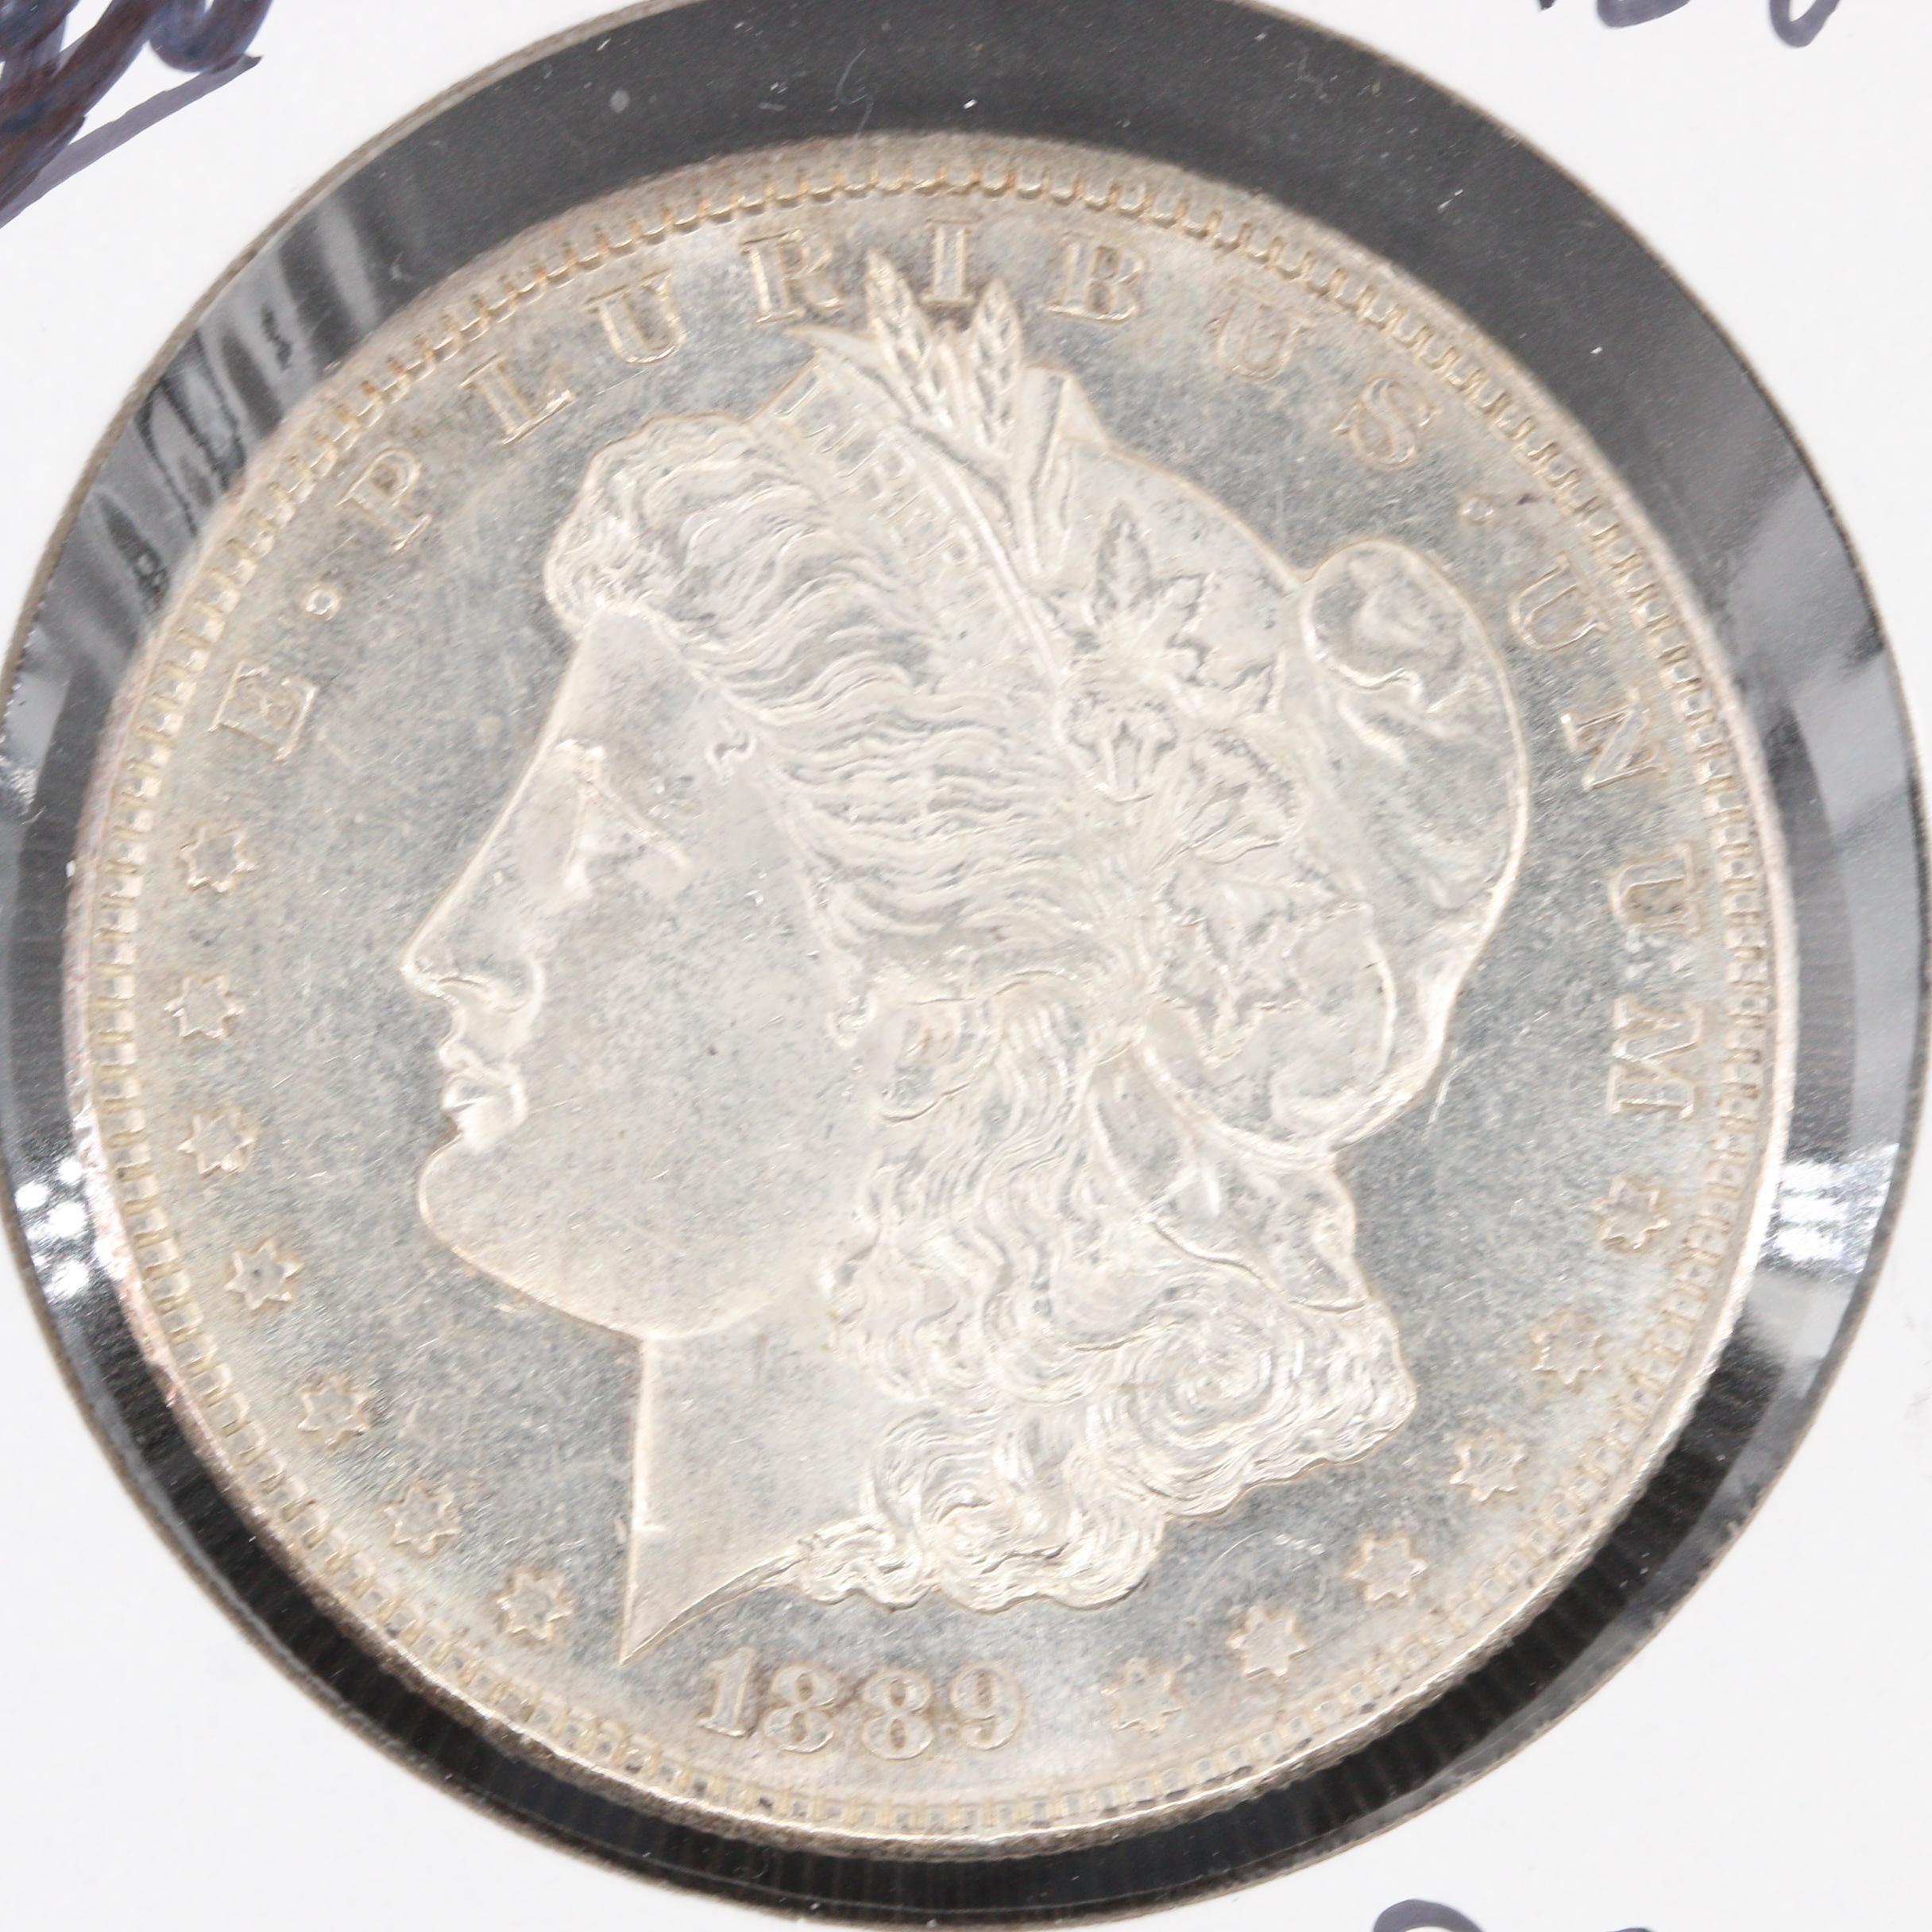 Low Mintage Better Date 1889-S Morgan Silver Dollar